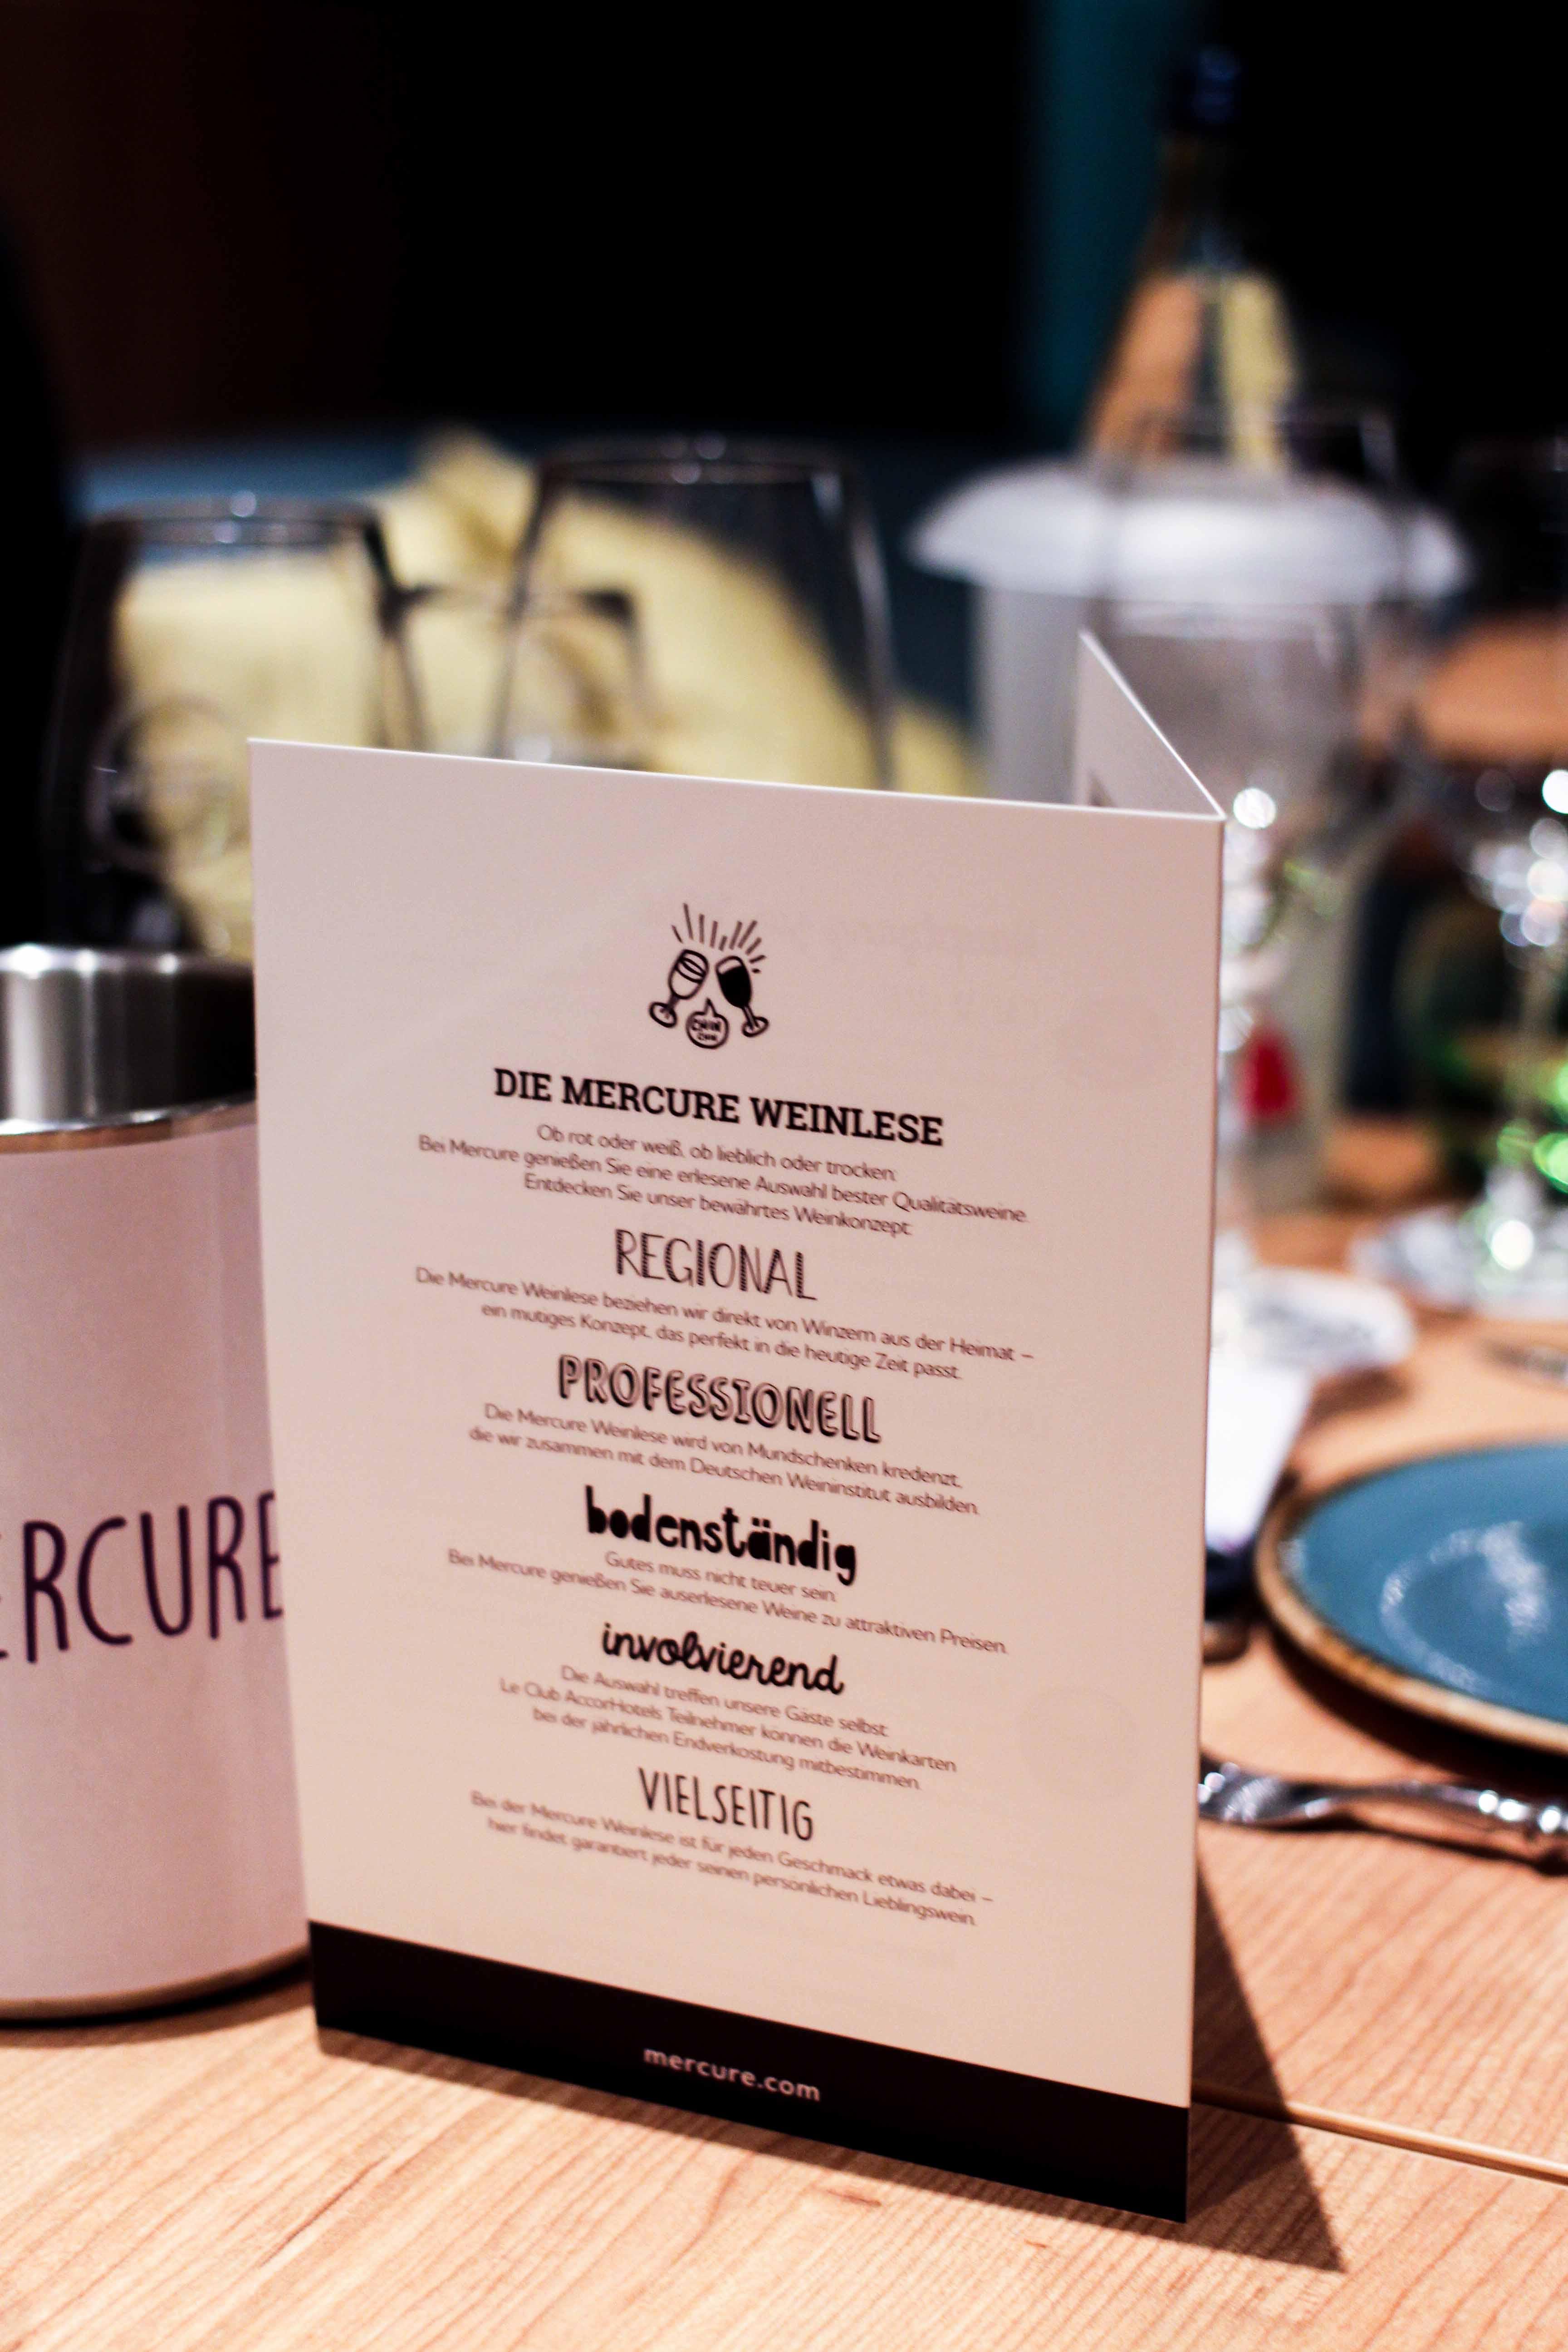 Mercure Weinlese Reiseblog Weinprobe Mercure Mannheim Weinkarte